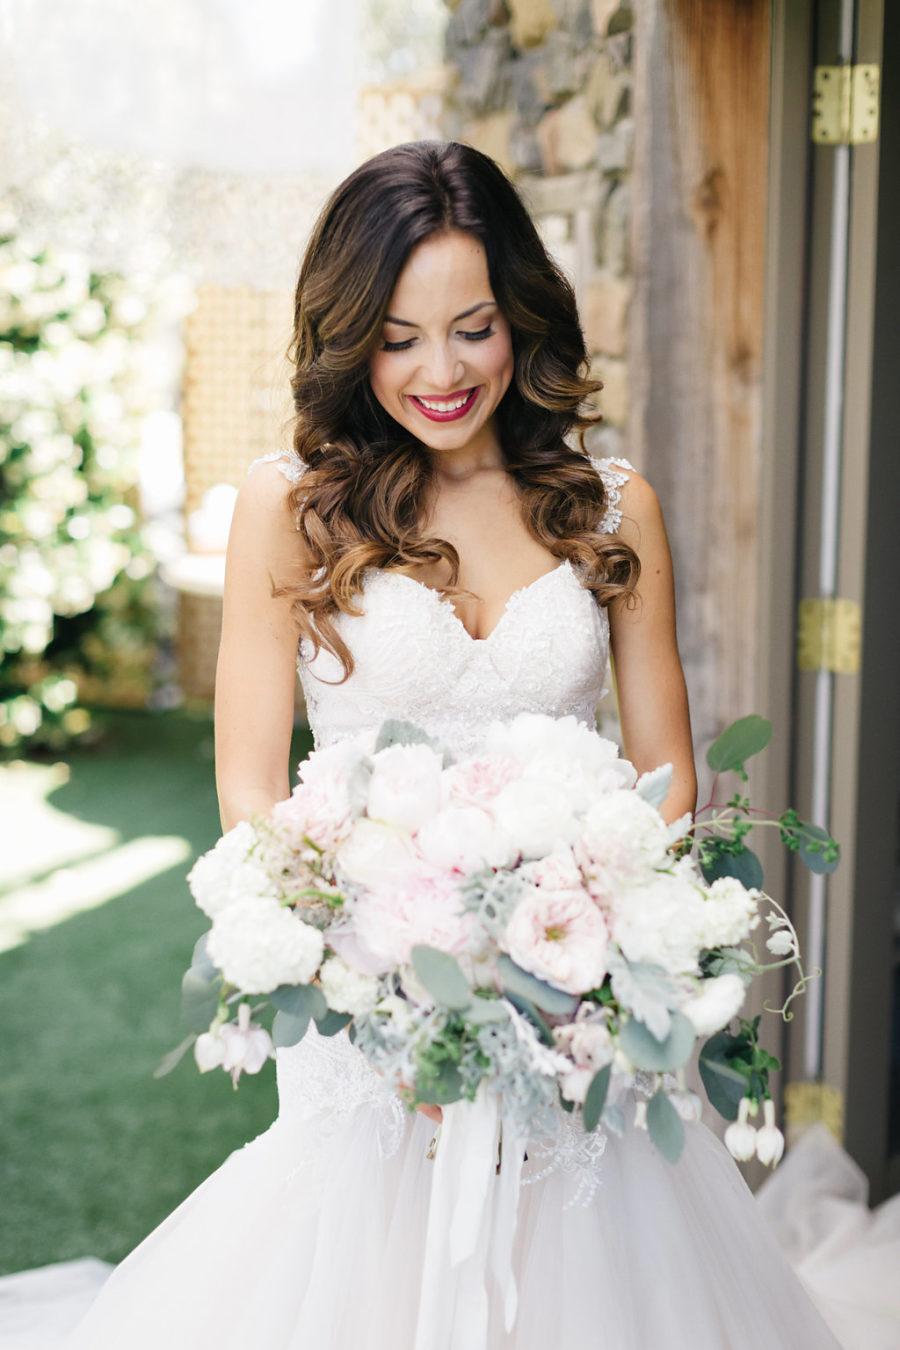 Rent A Wedding Dress San Diego 79 Lovely